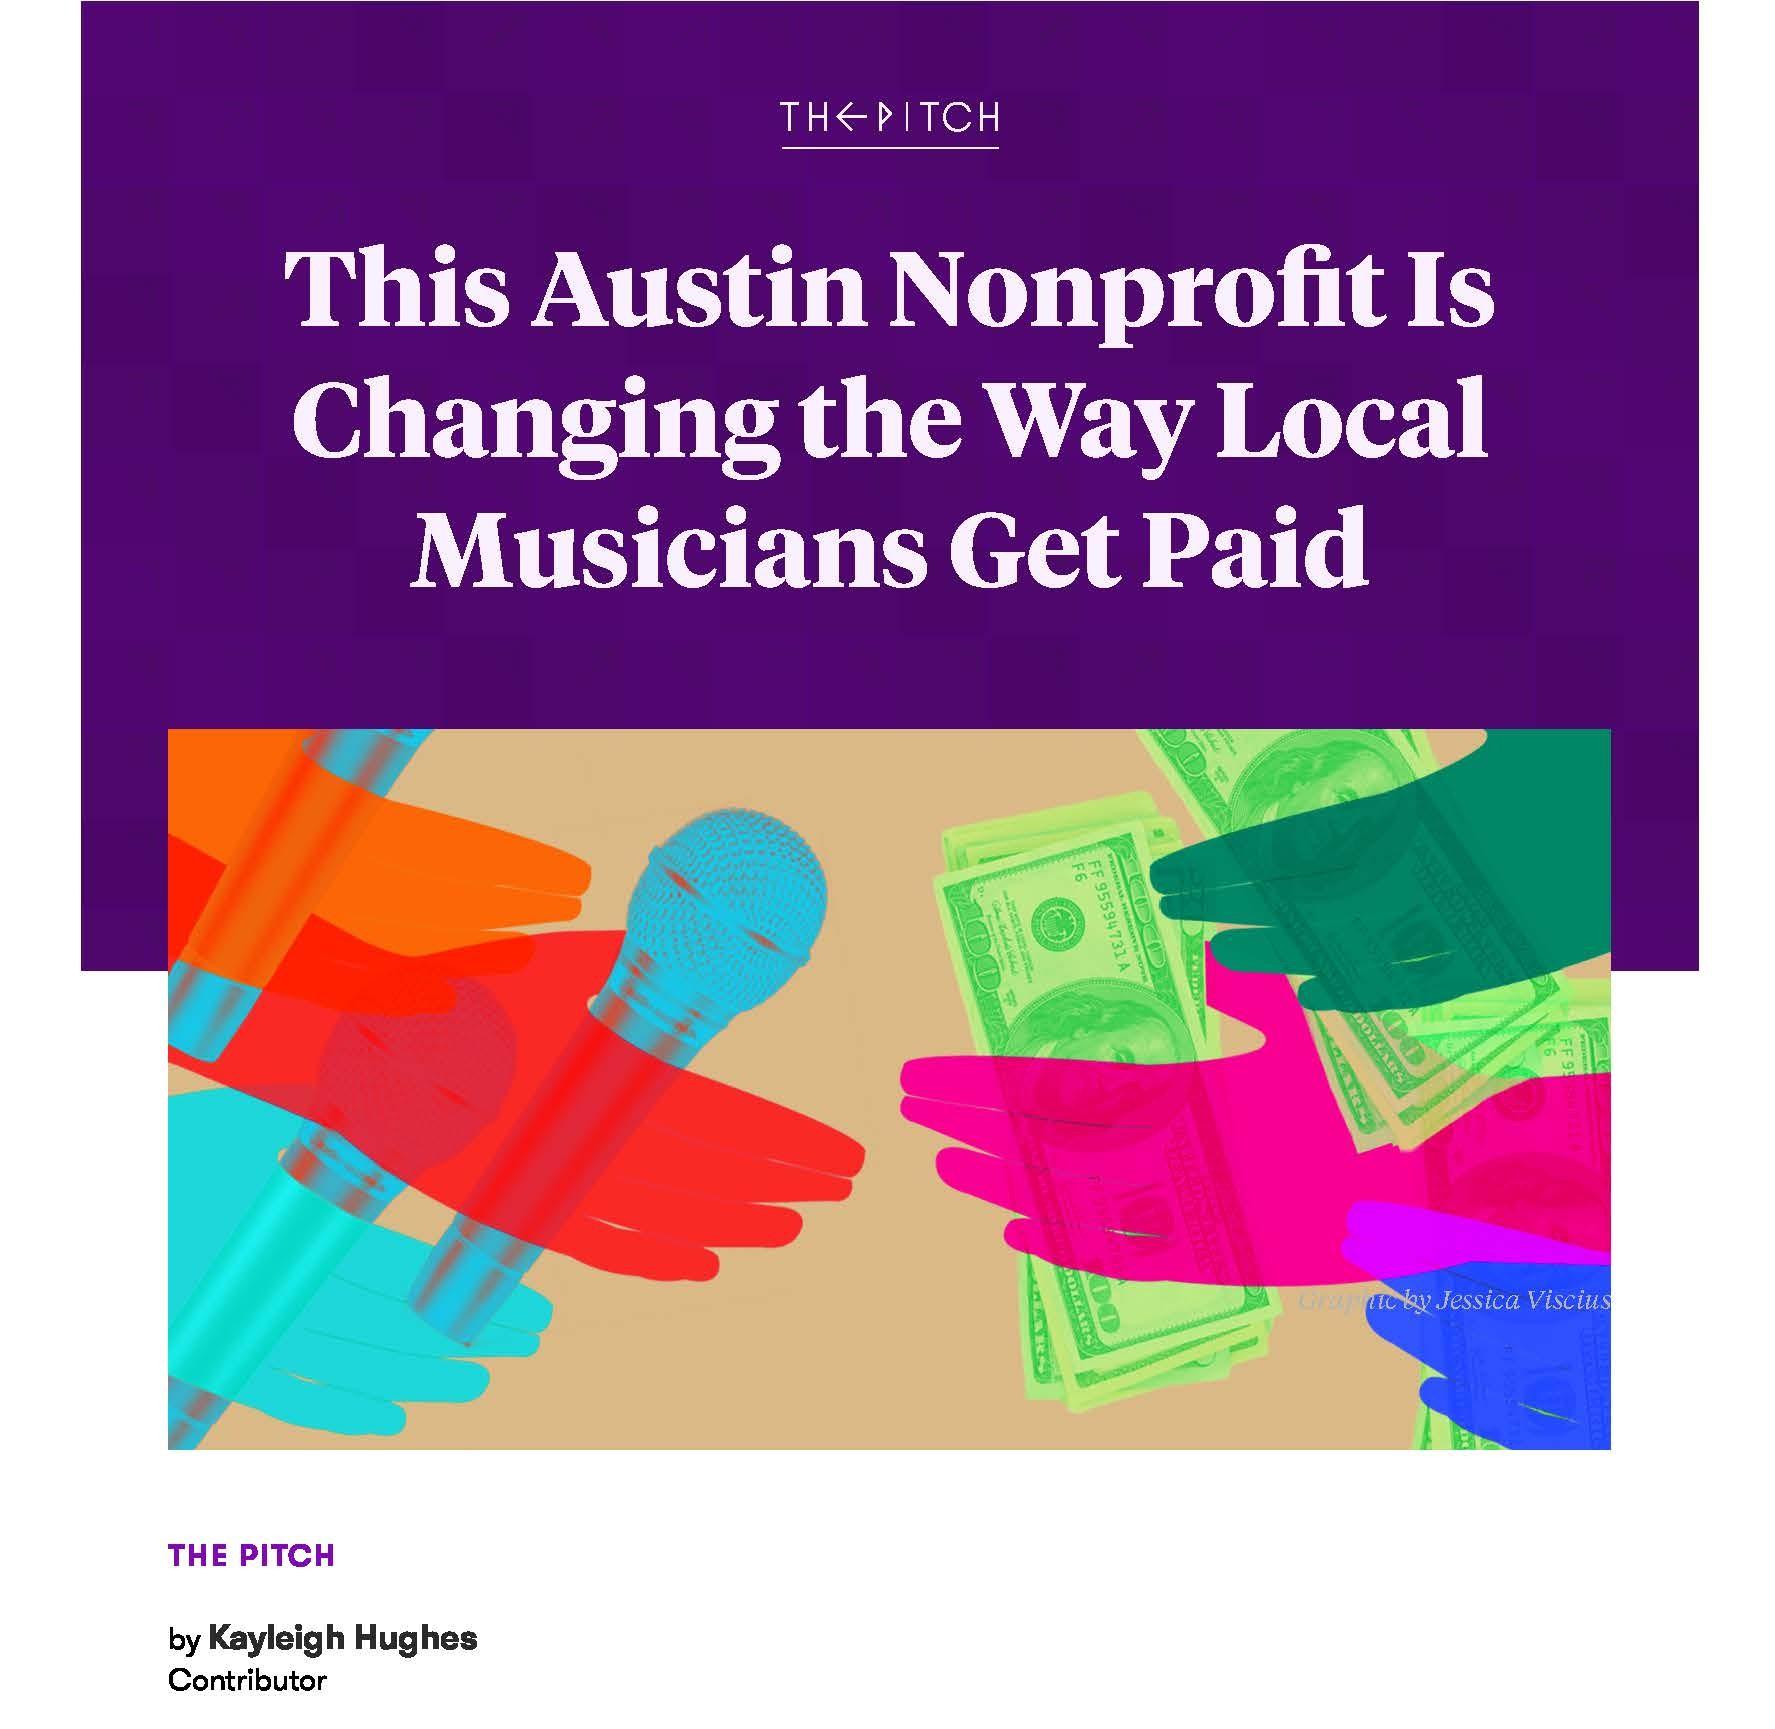 Austin Nonprofit